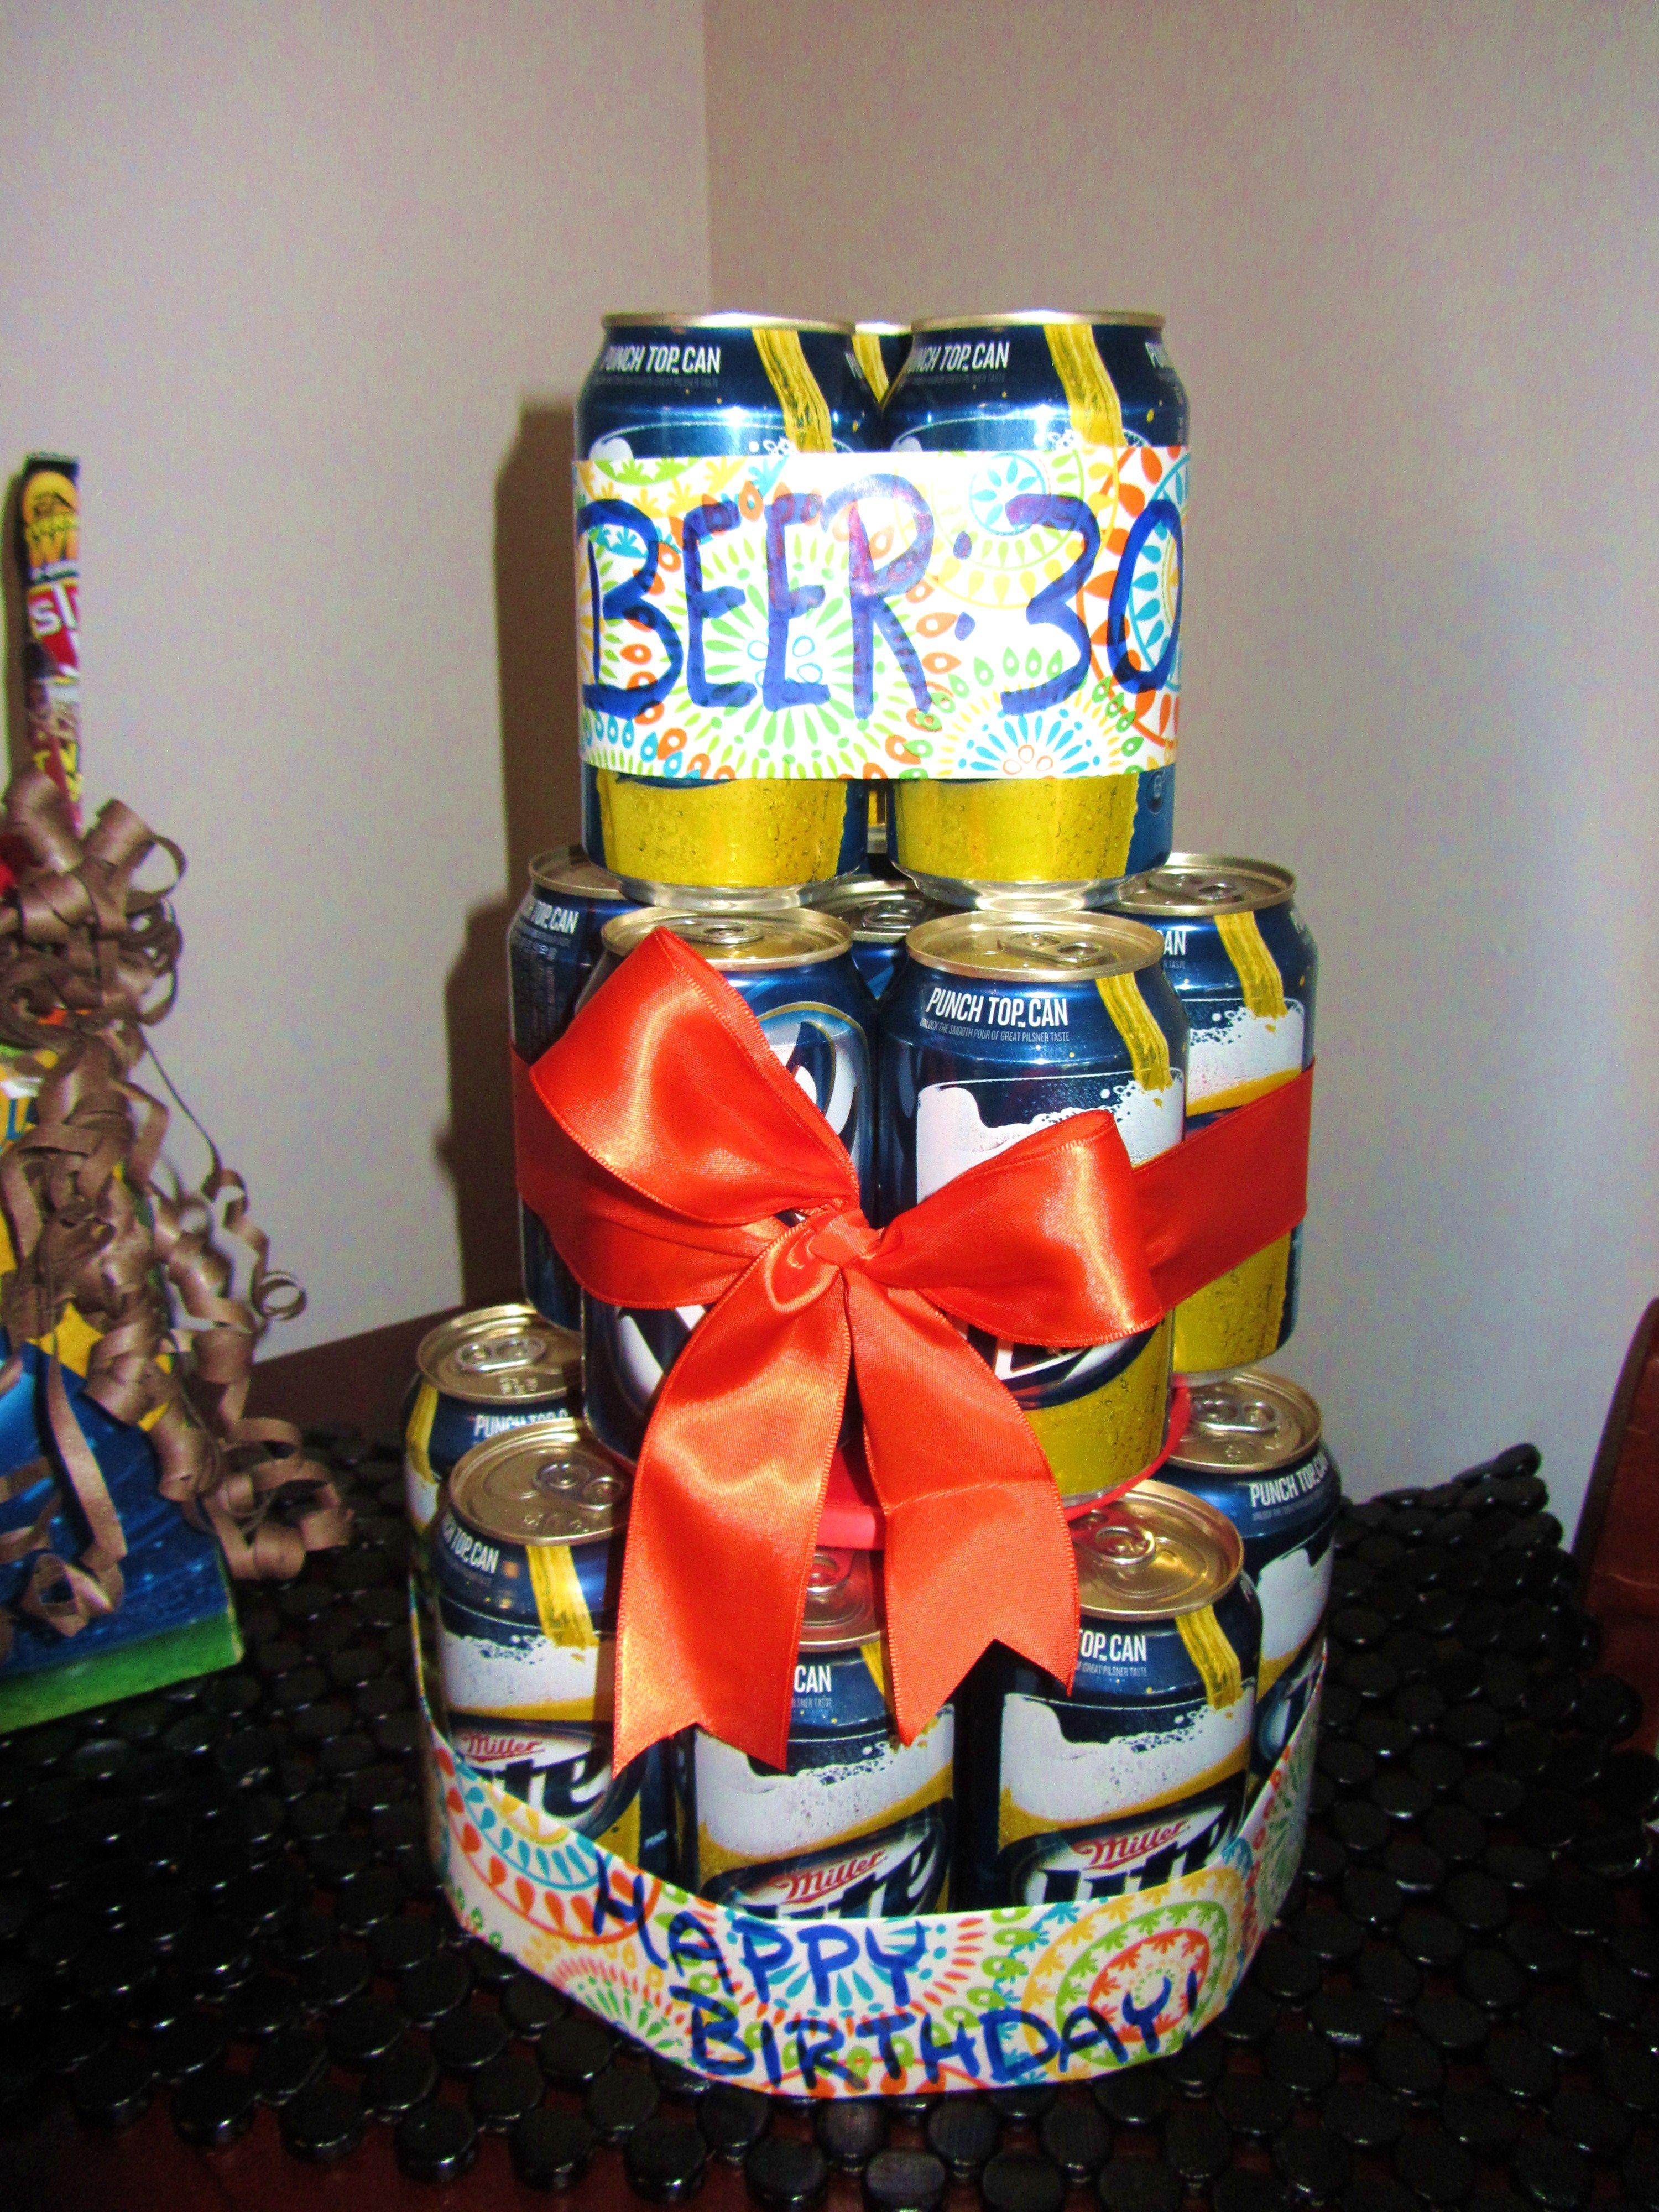 Beer30 birthday cake for 30th birthday 30 birthday